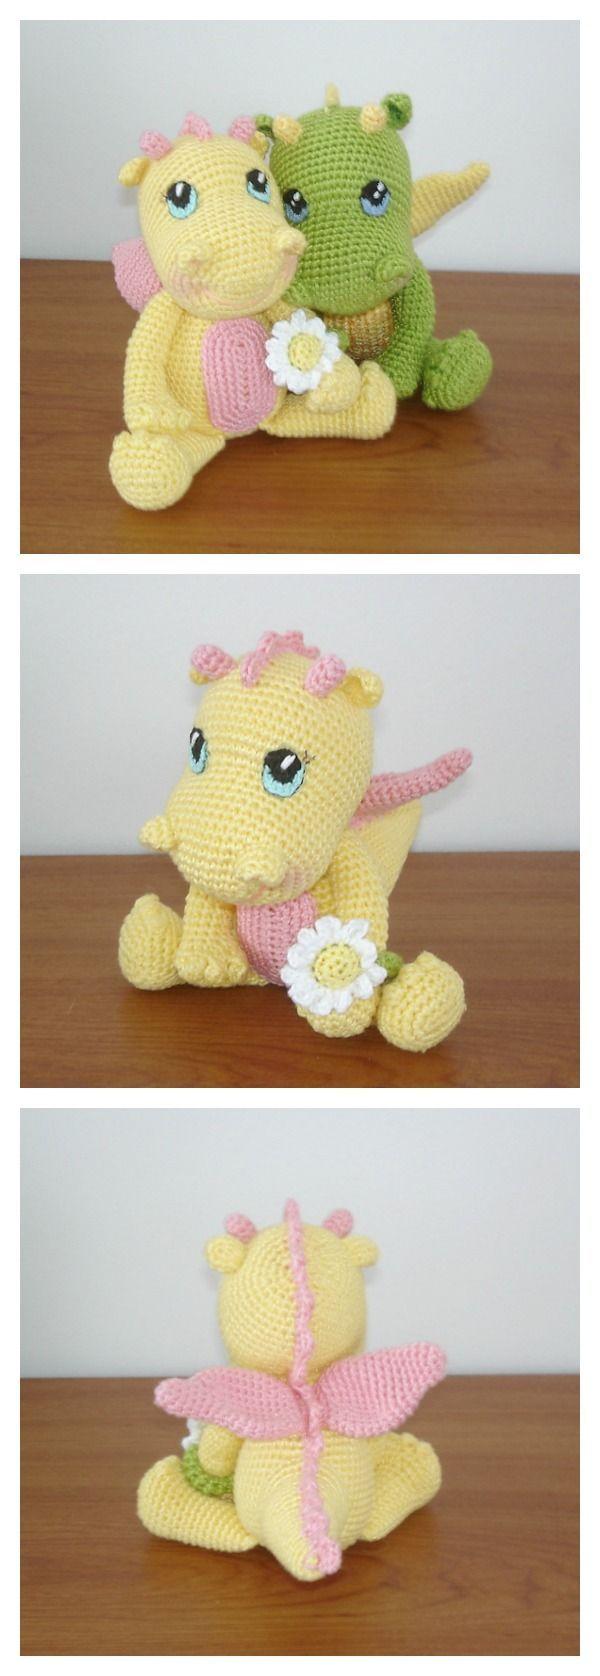 Crochet Amigurumi Dinosaur Free Pattern